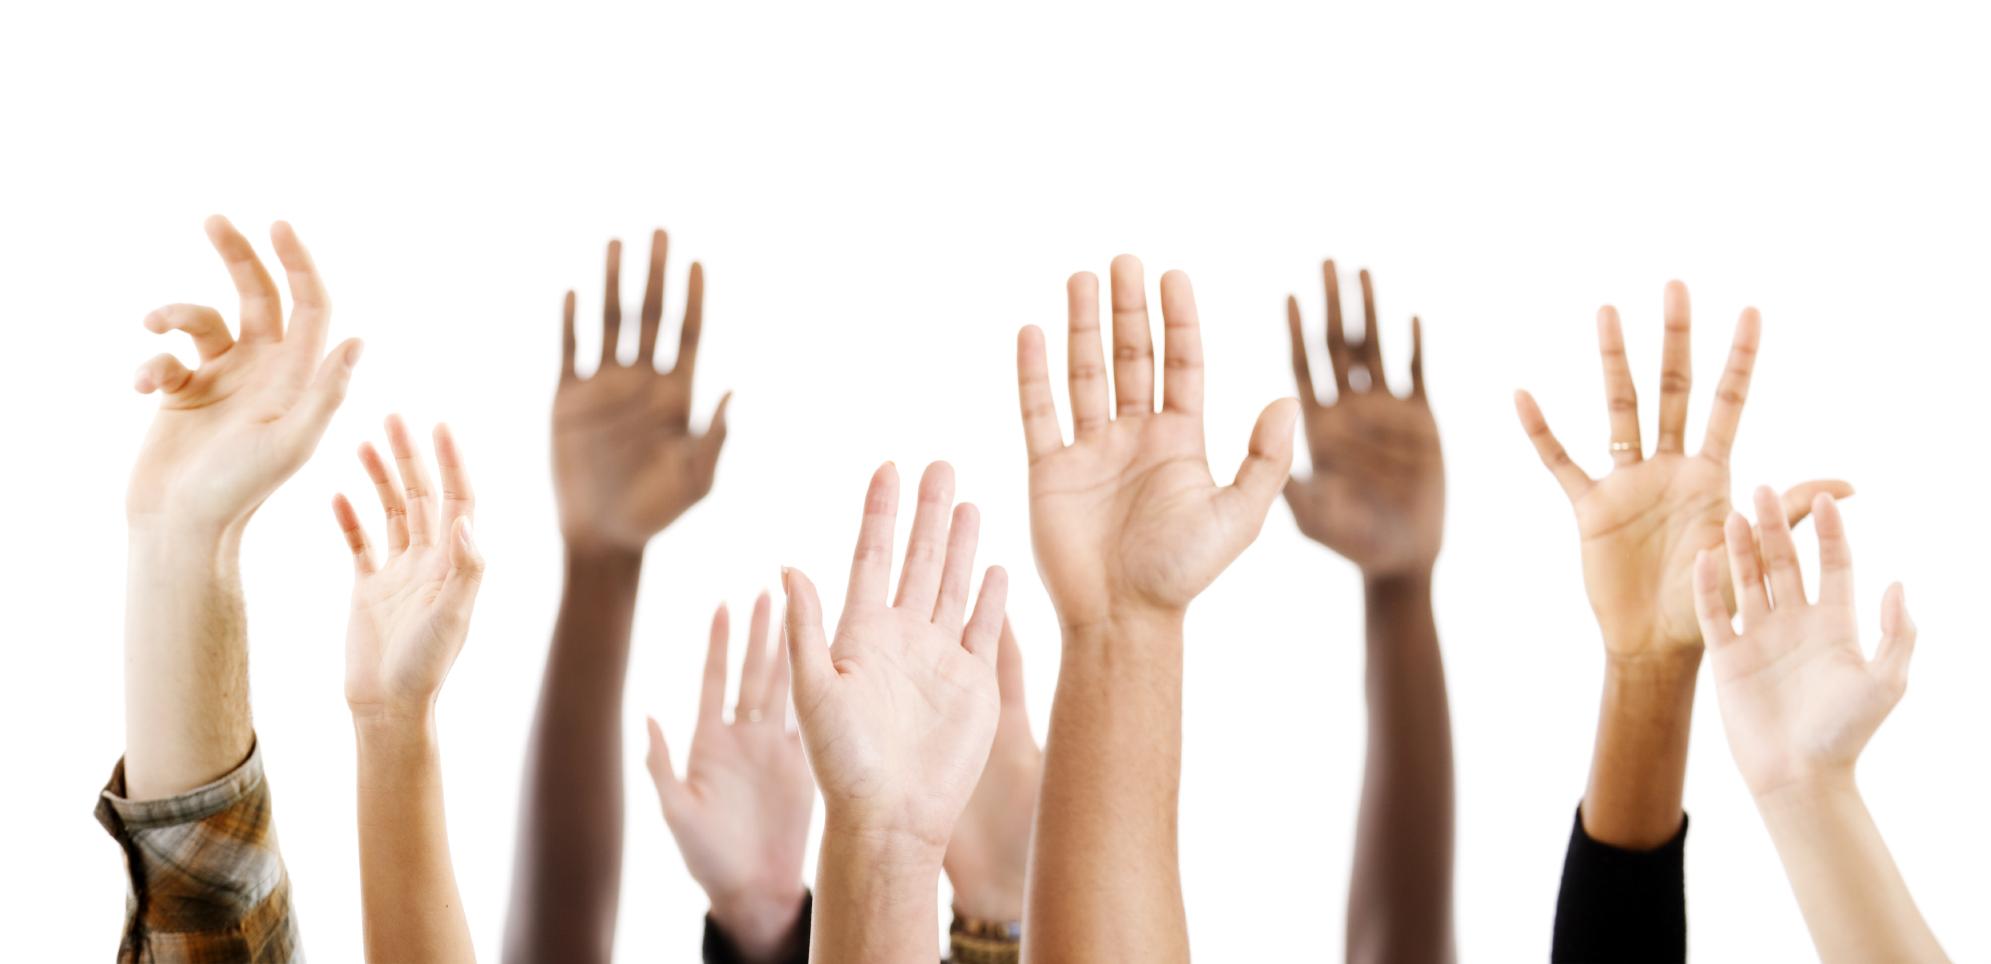 Worship Hand Clipart